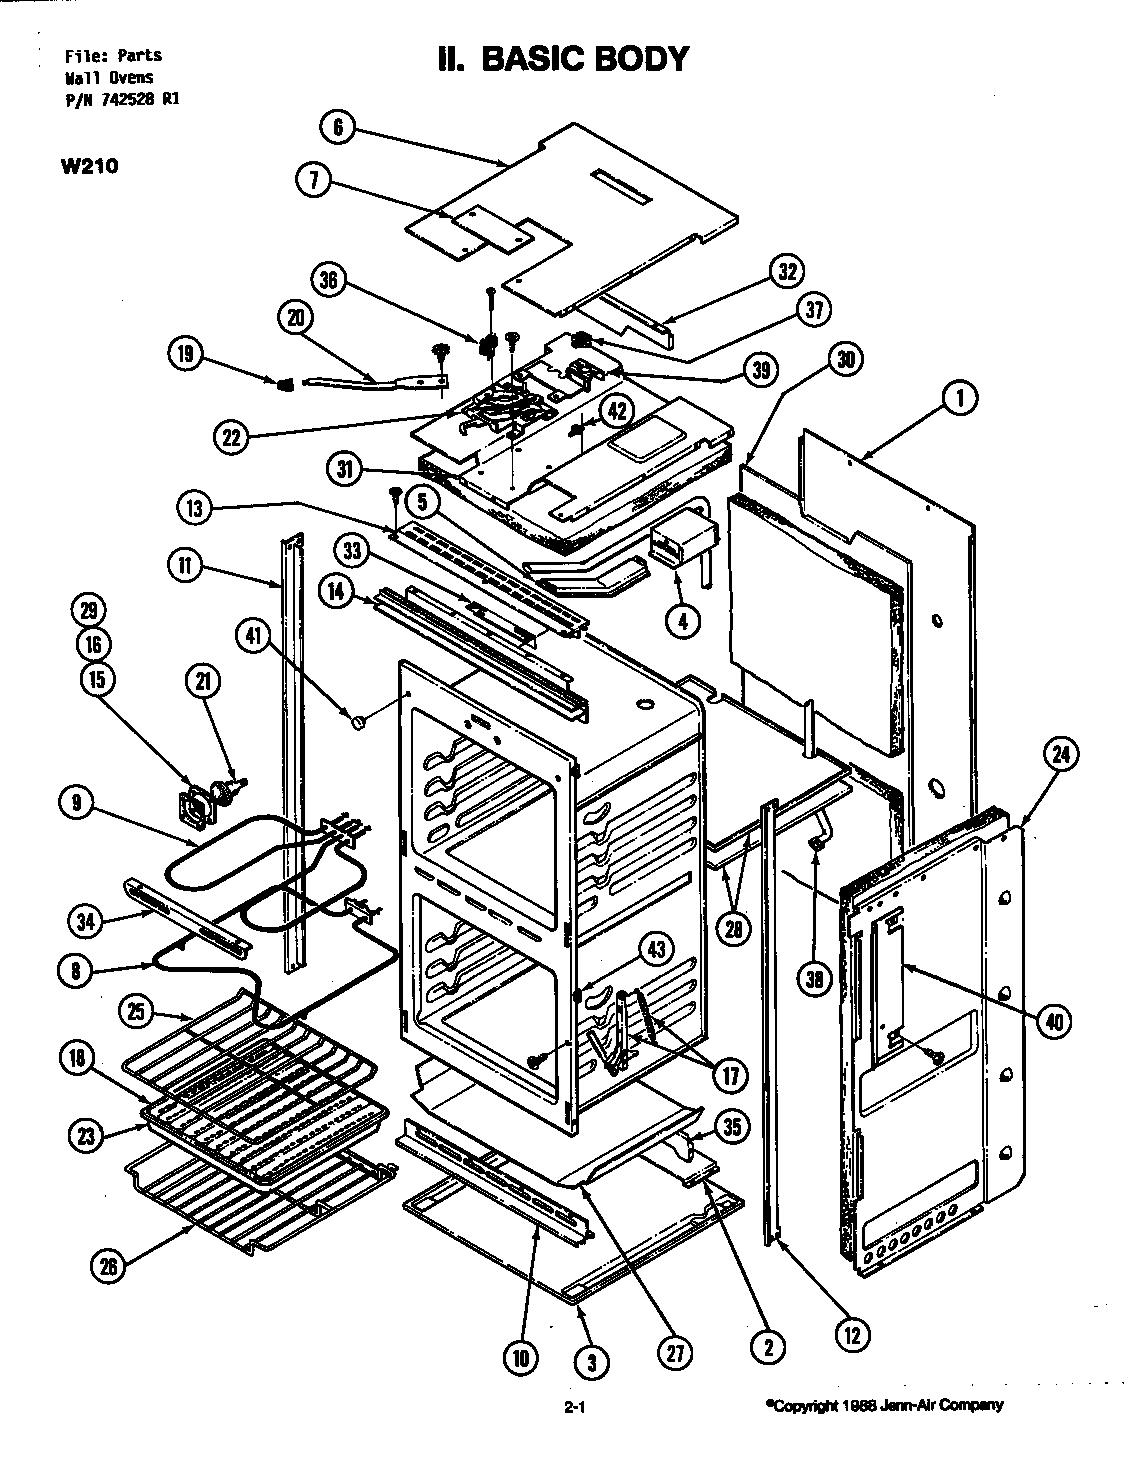 BODY Diagram & Parts List for Model w215 Jenn-air-Parts